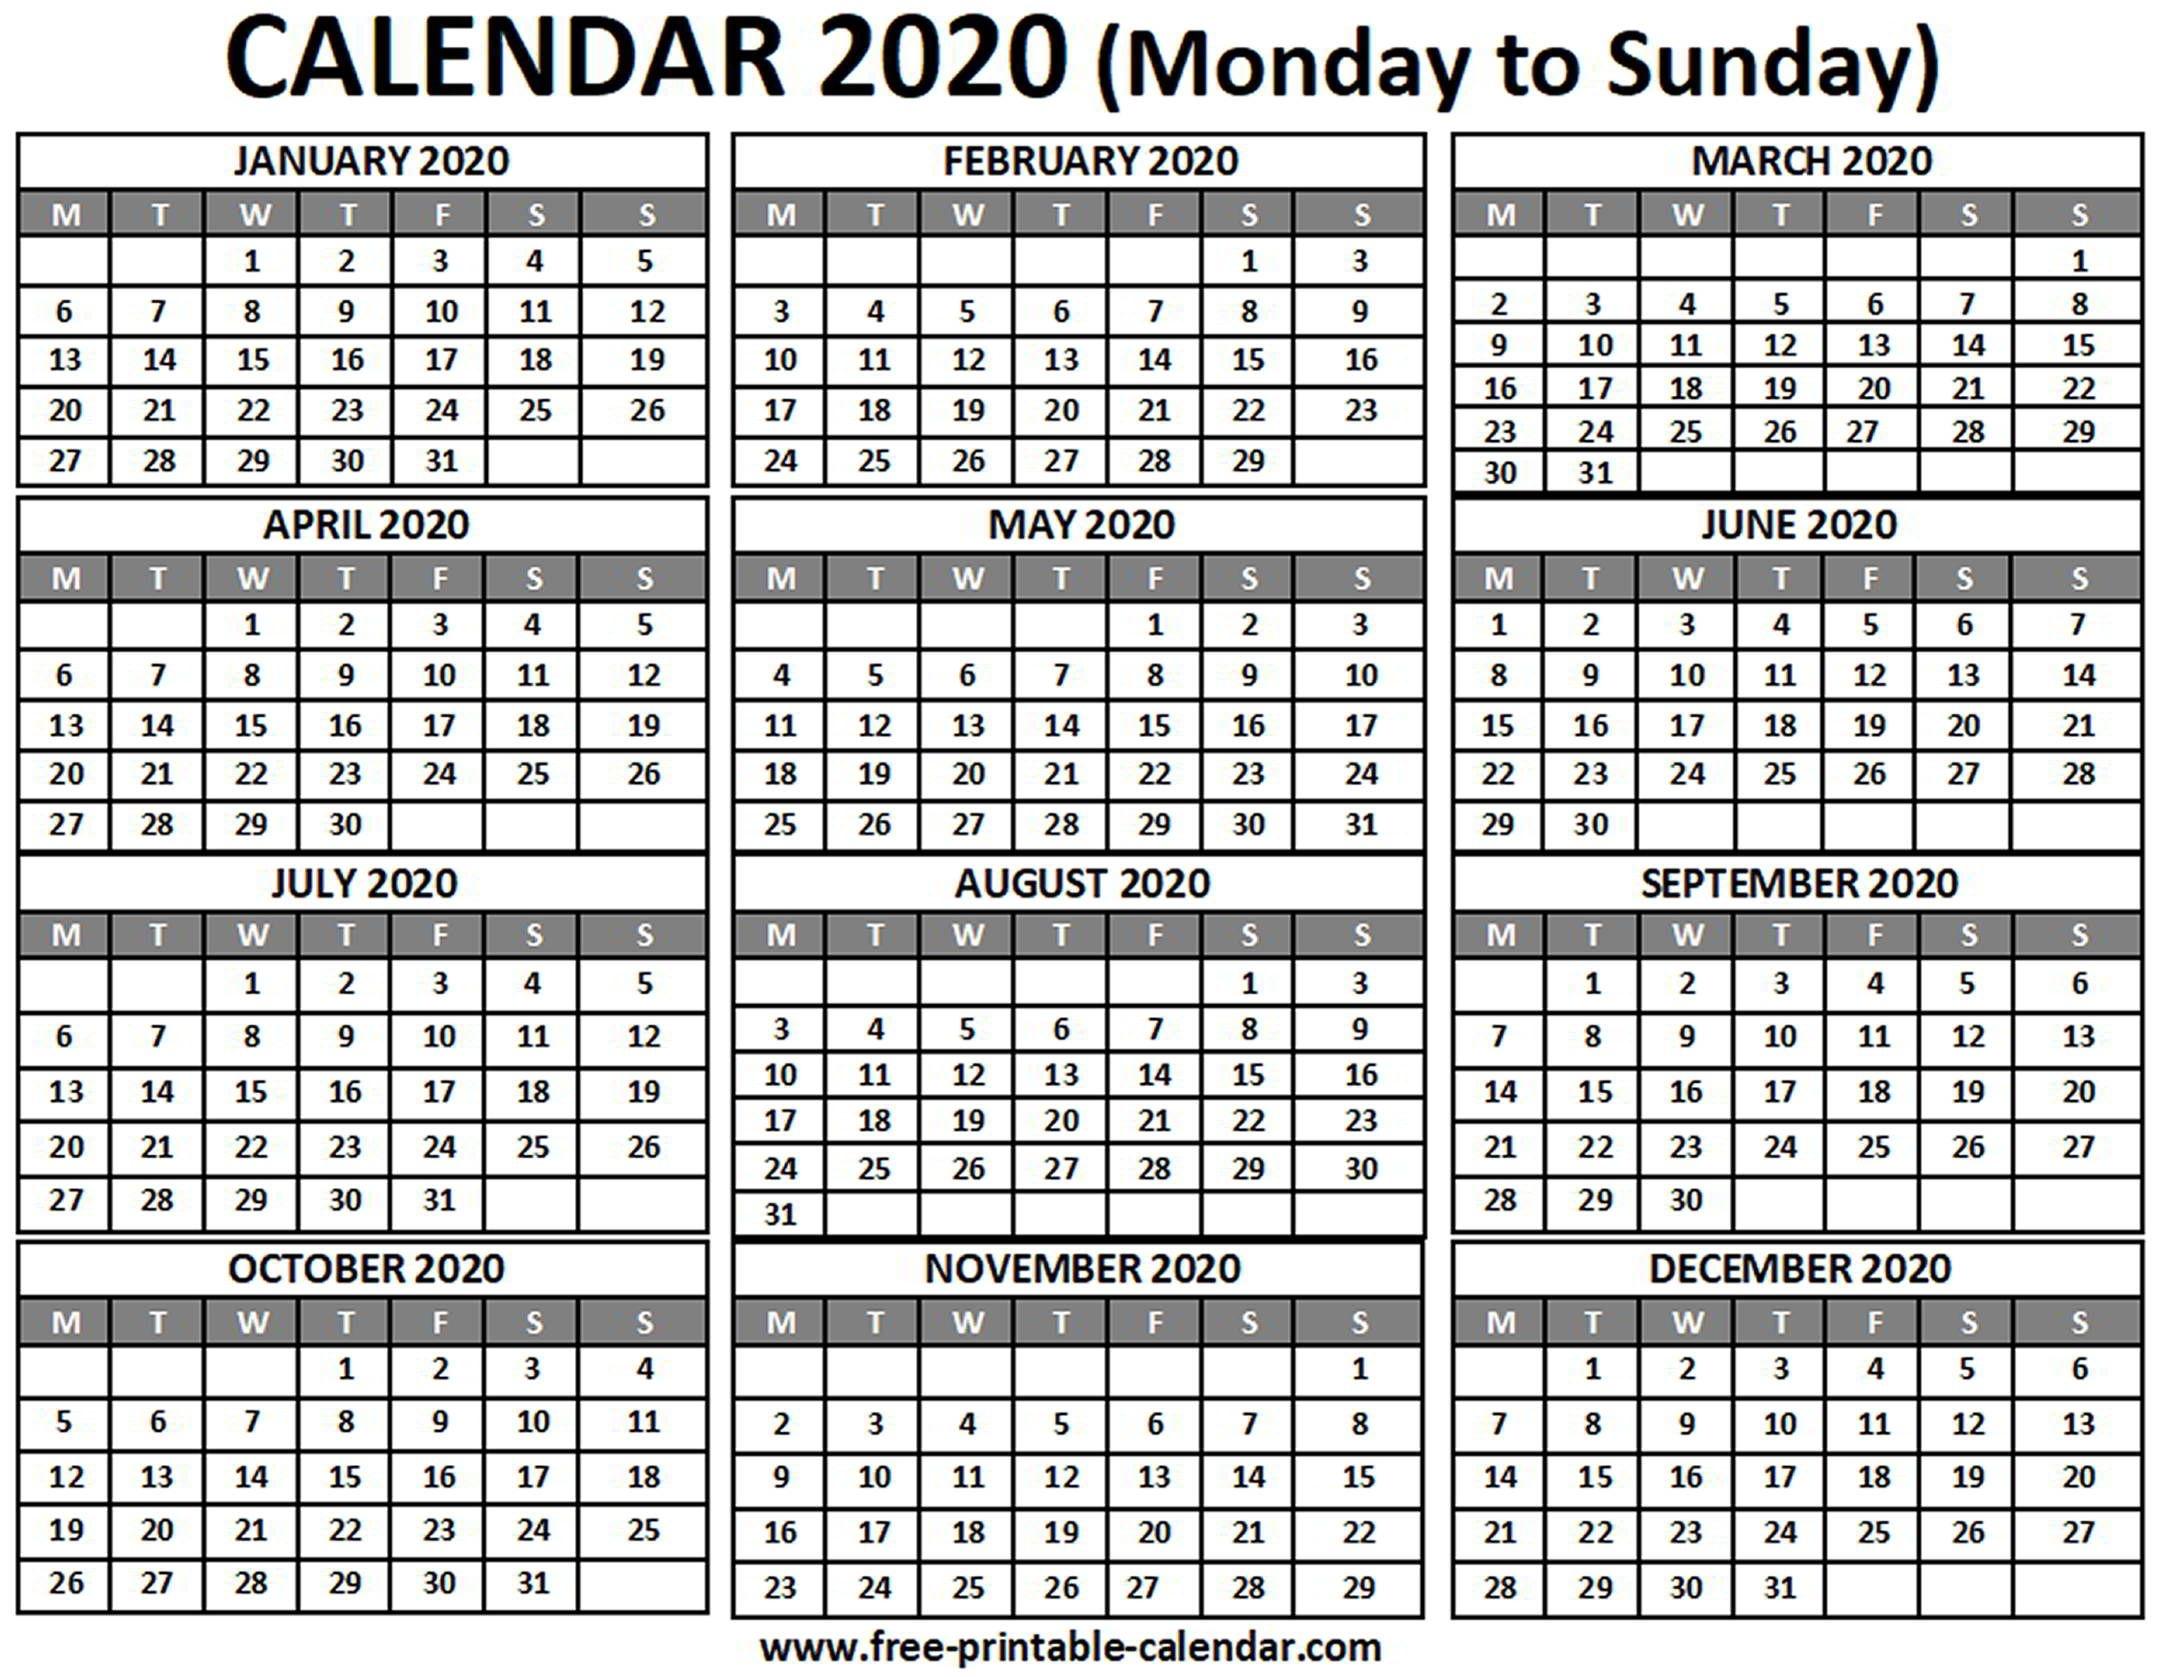 2020 Calendar - Free-Printable-Calendar